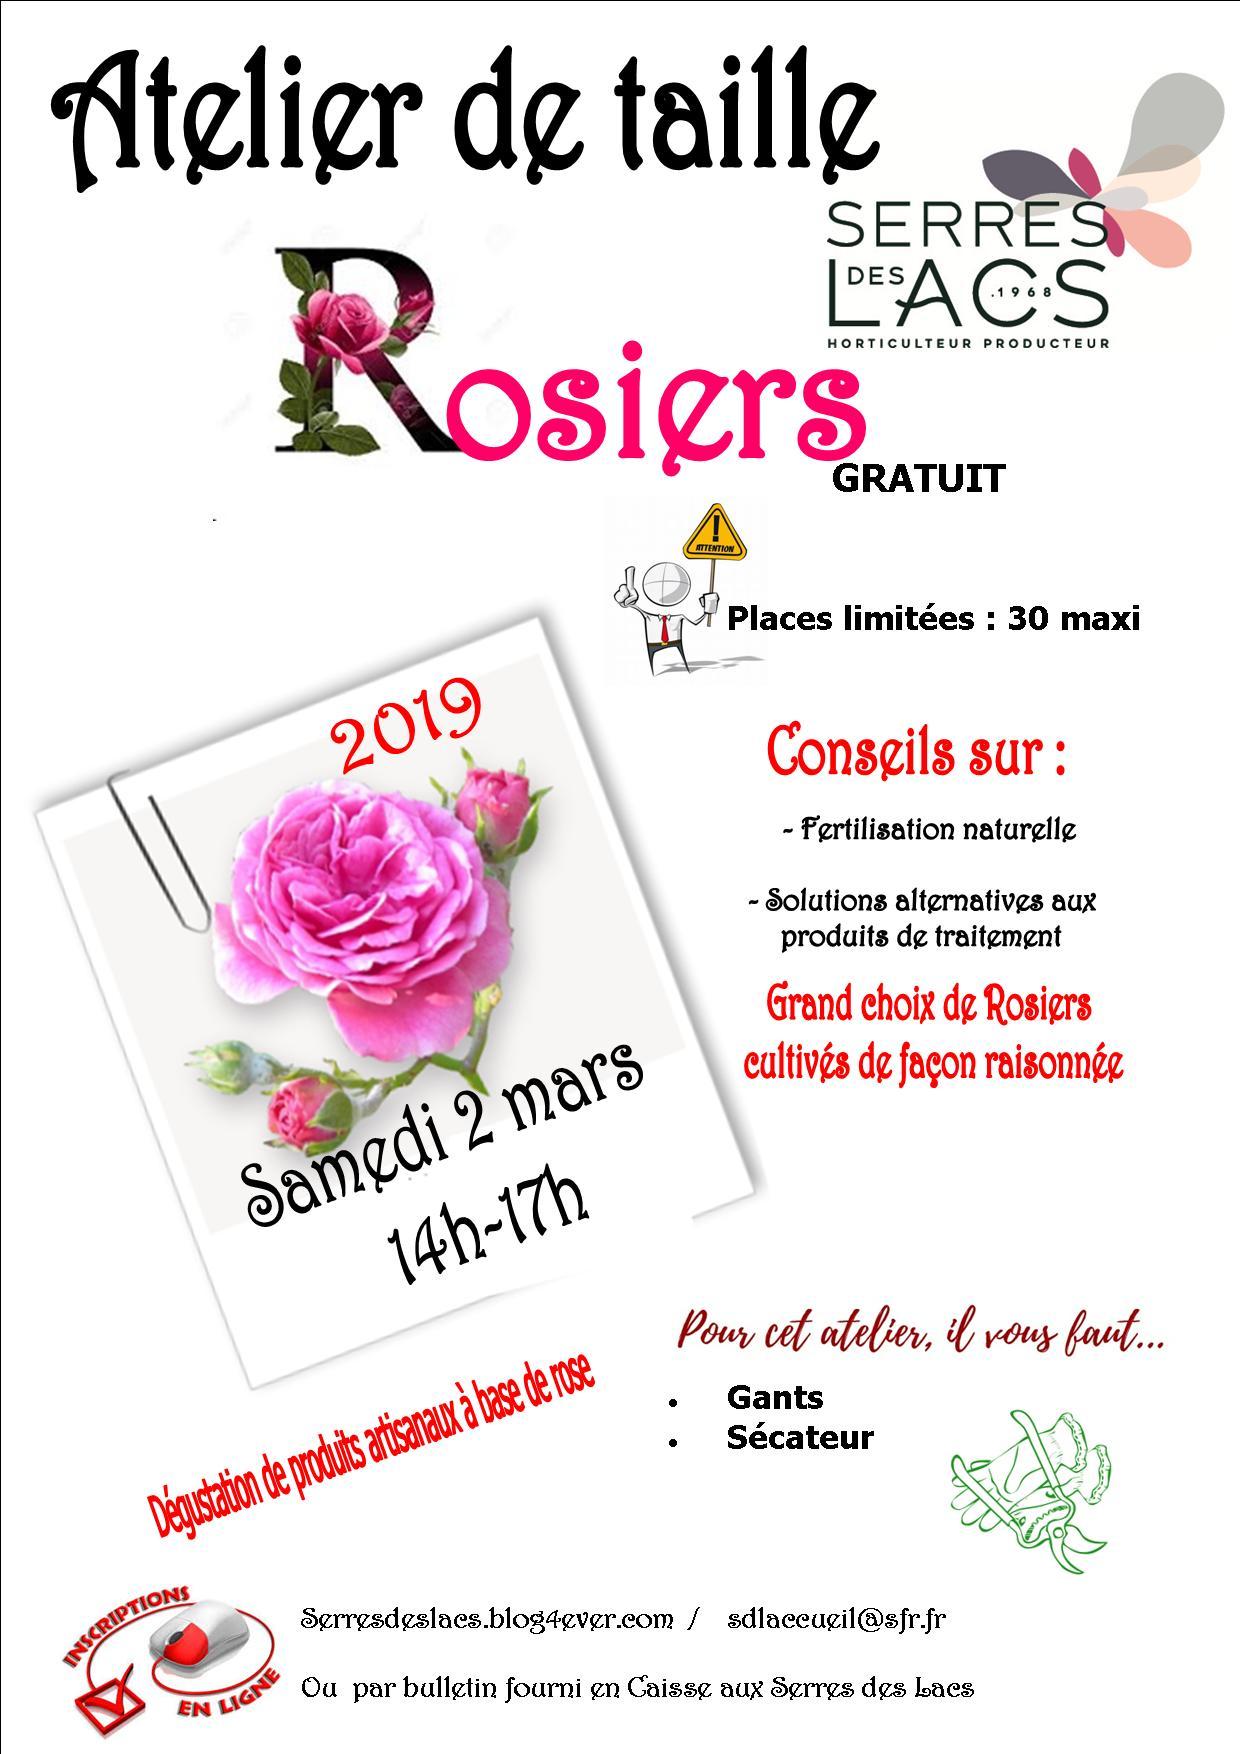 atelier taille rosier format A4 2019.jpg